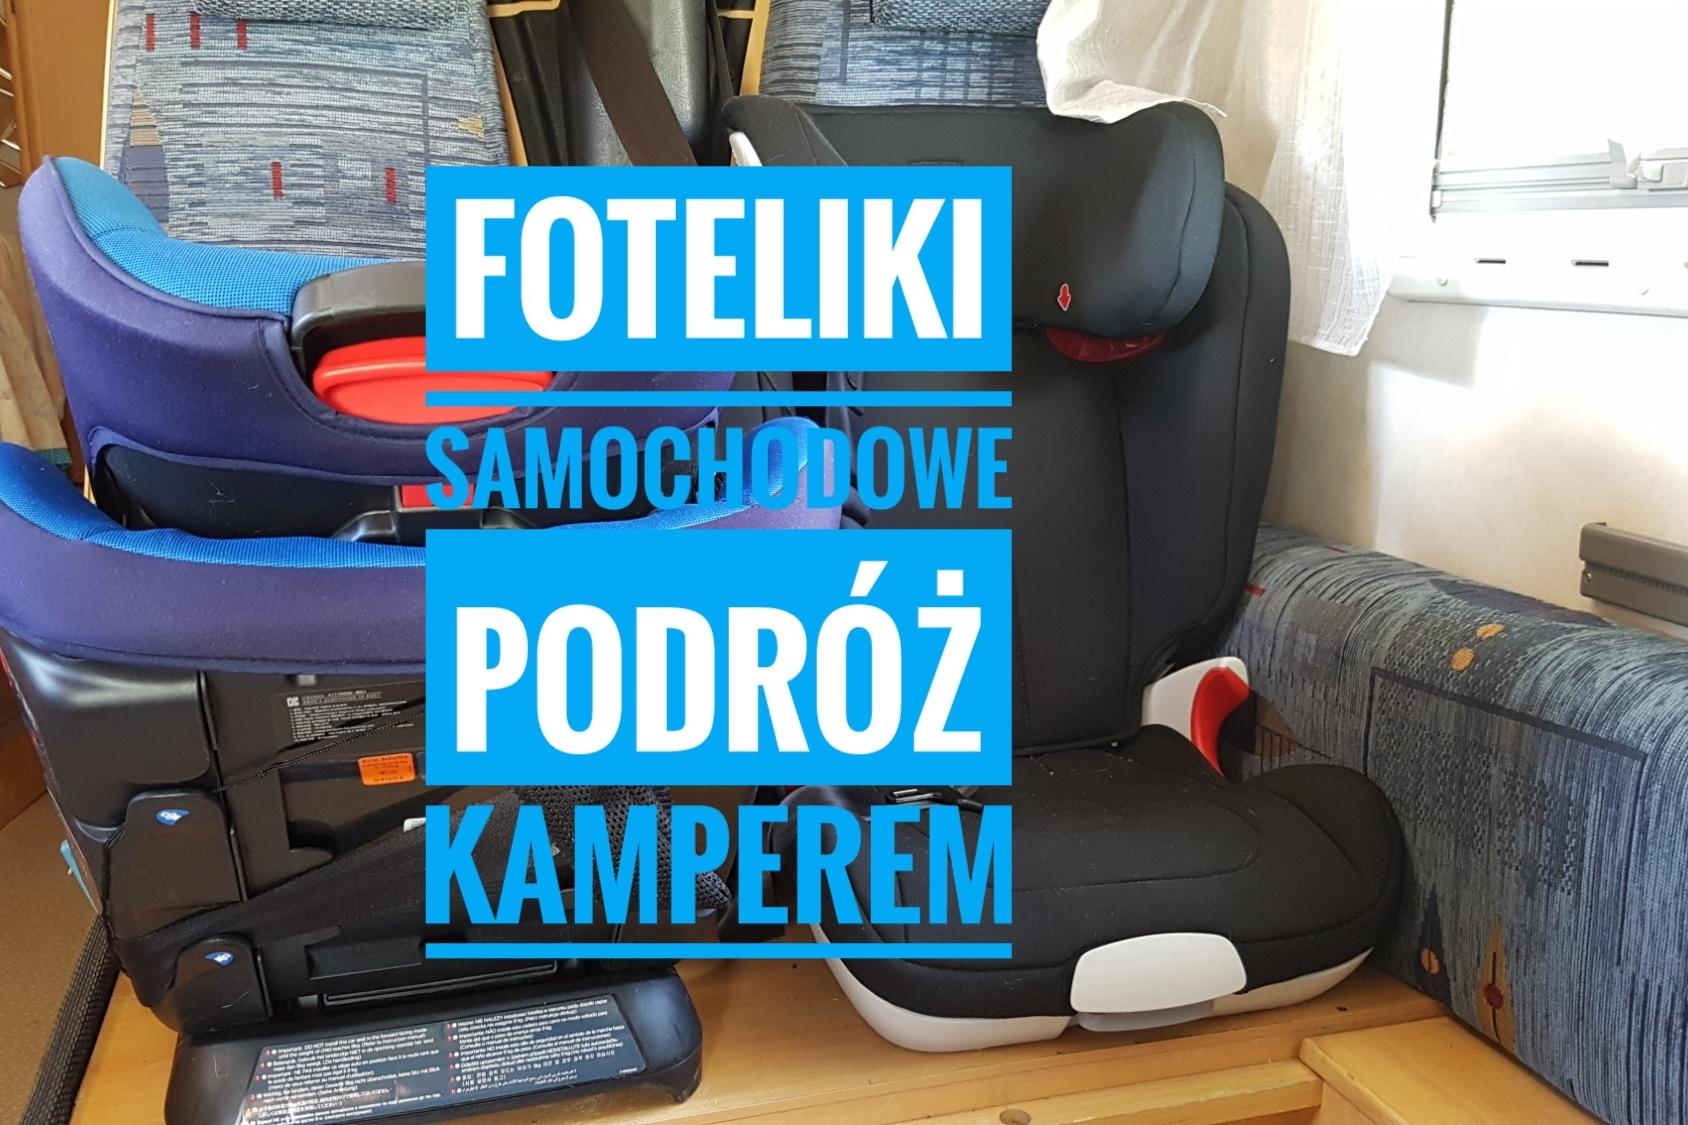 Foteliki a podróż kamperem